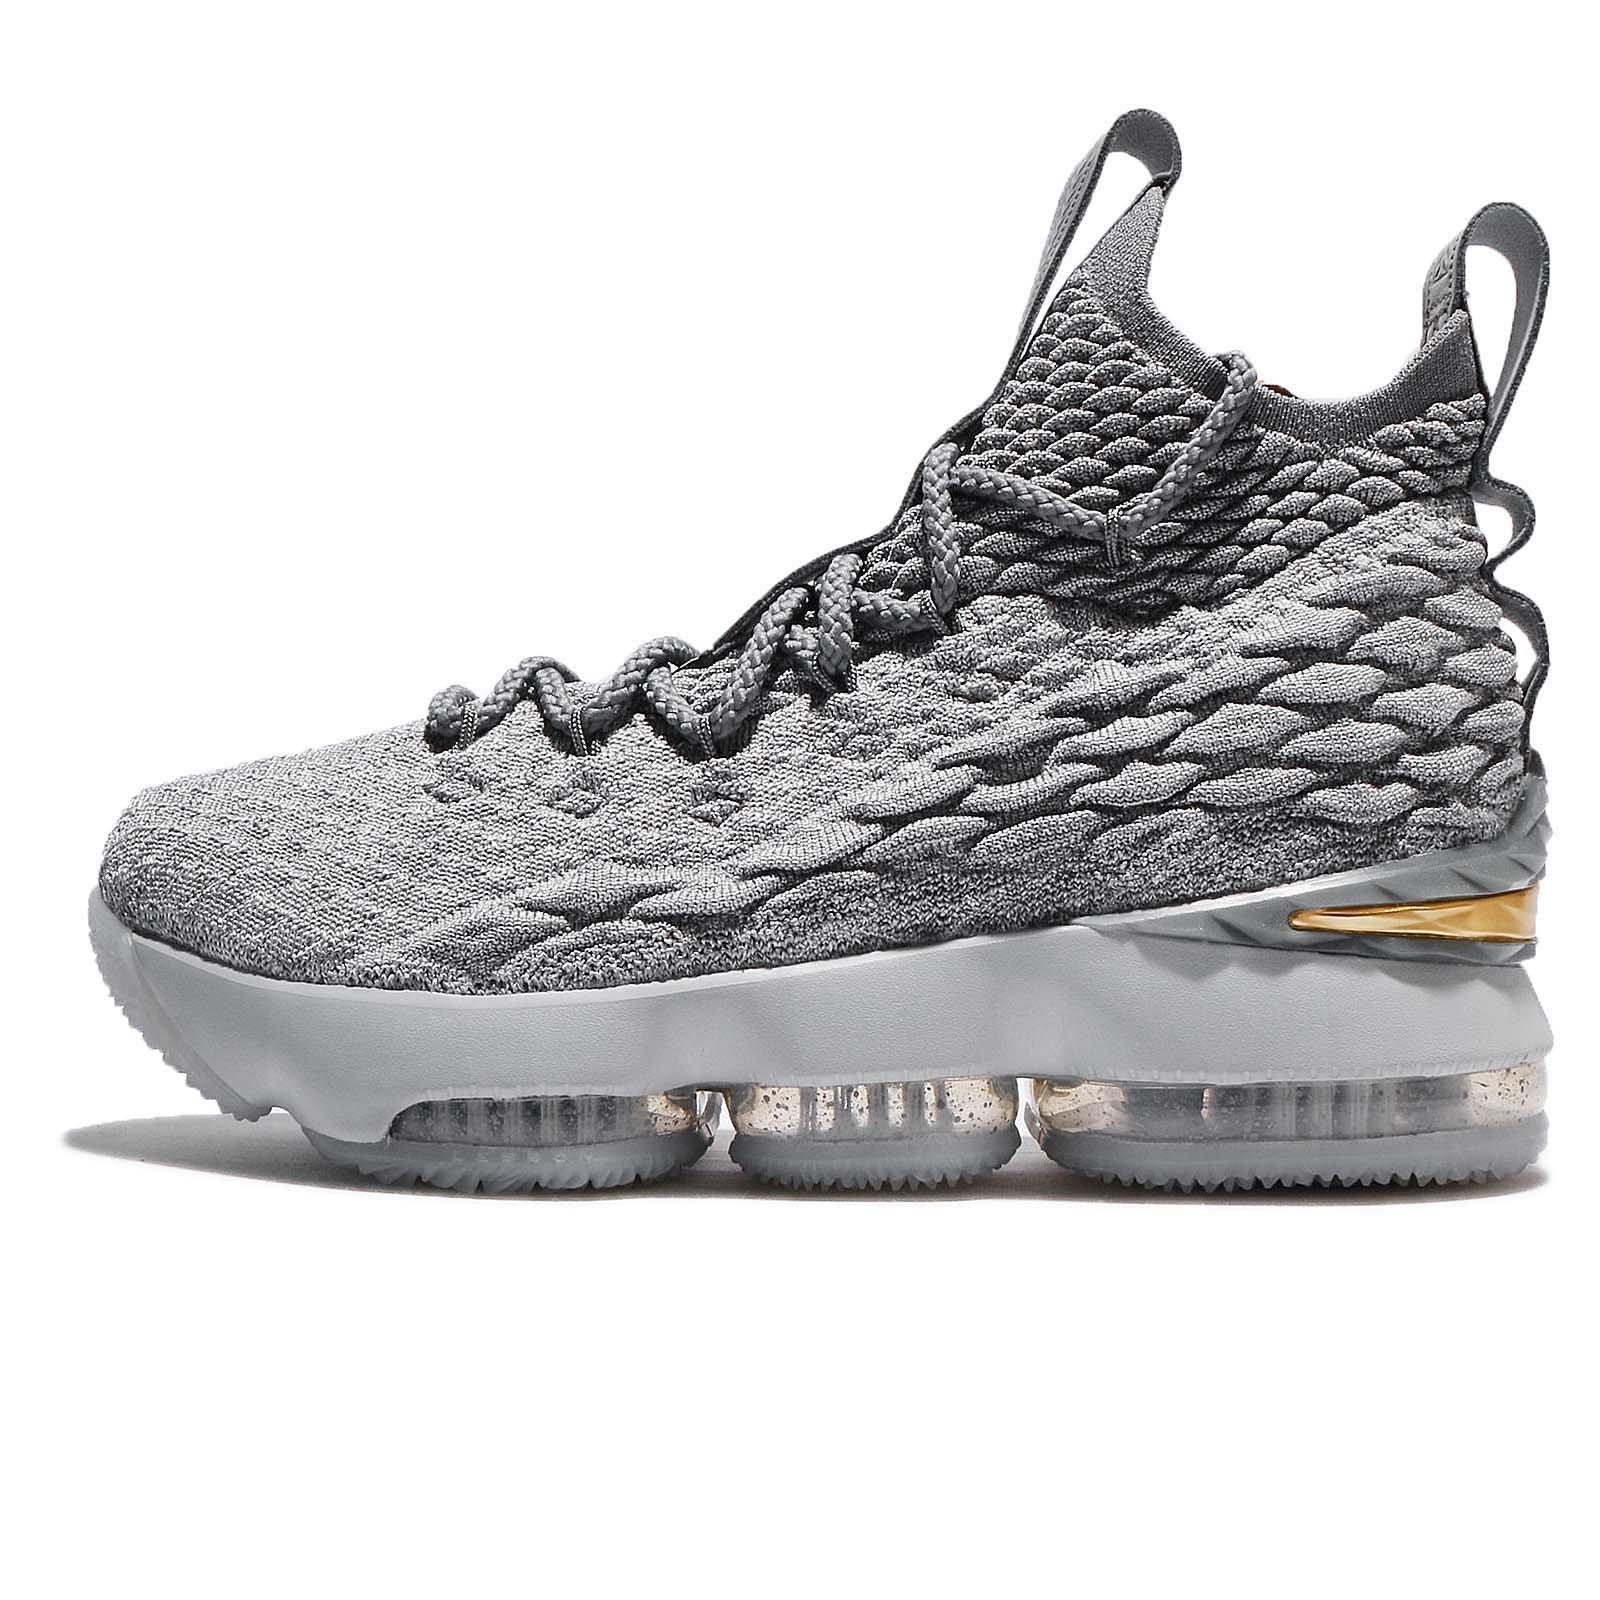 NIKE Youth Lebron 15 Boys Basketball Shoes Wolf Grey/Cool Grey/Metallic Gold 922811-005 Size 7